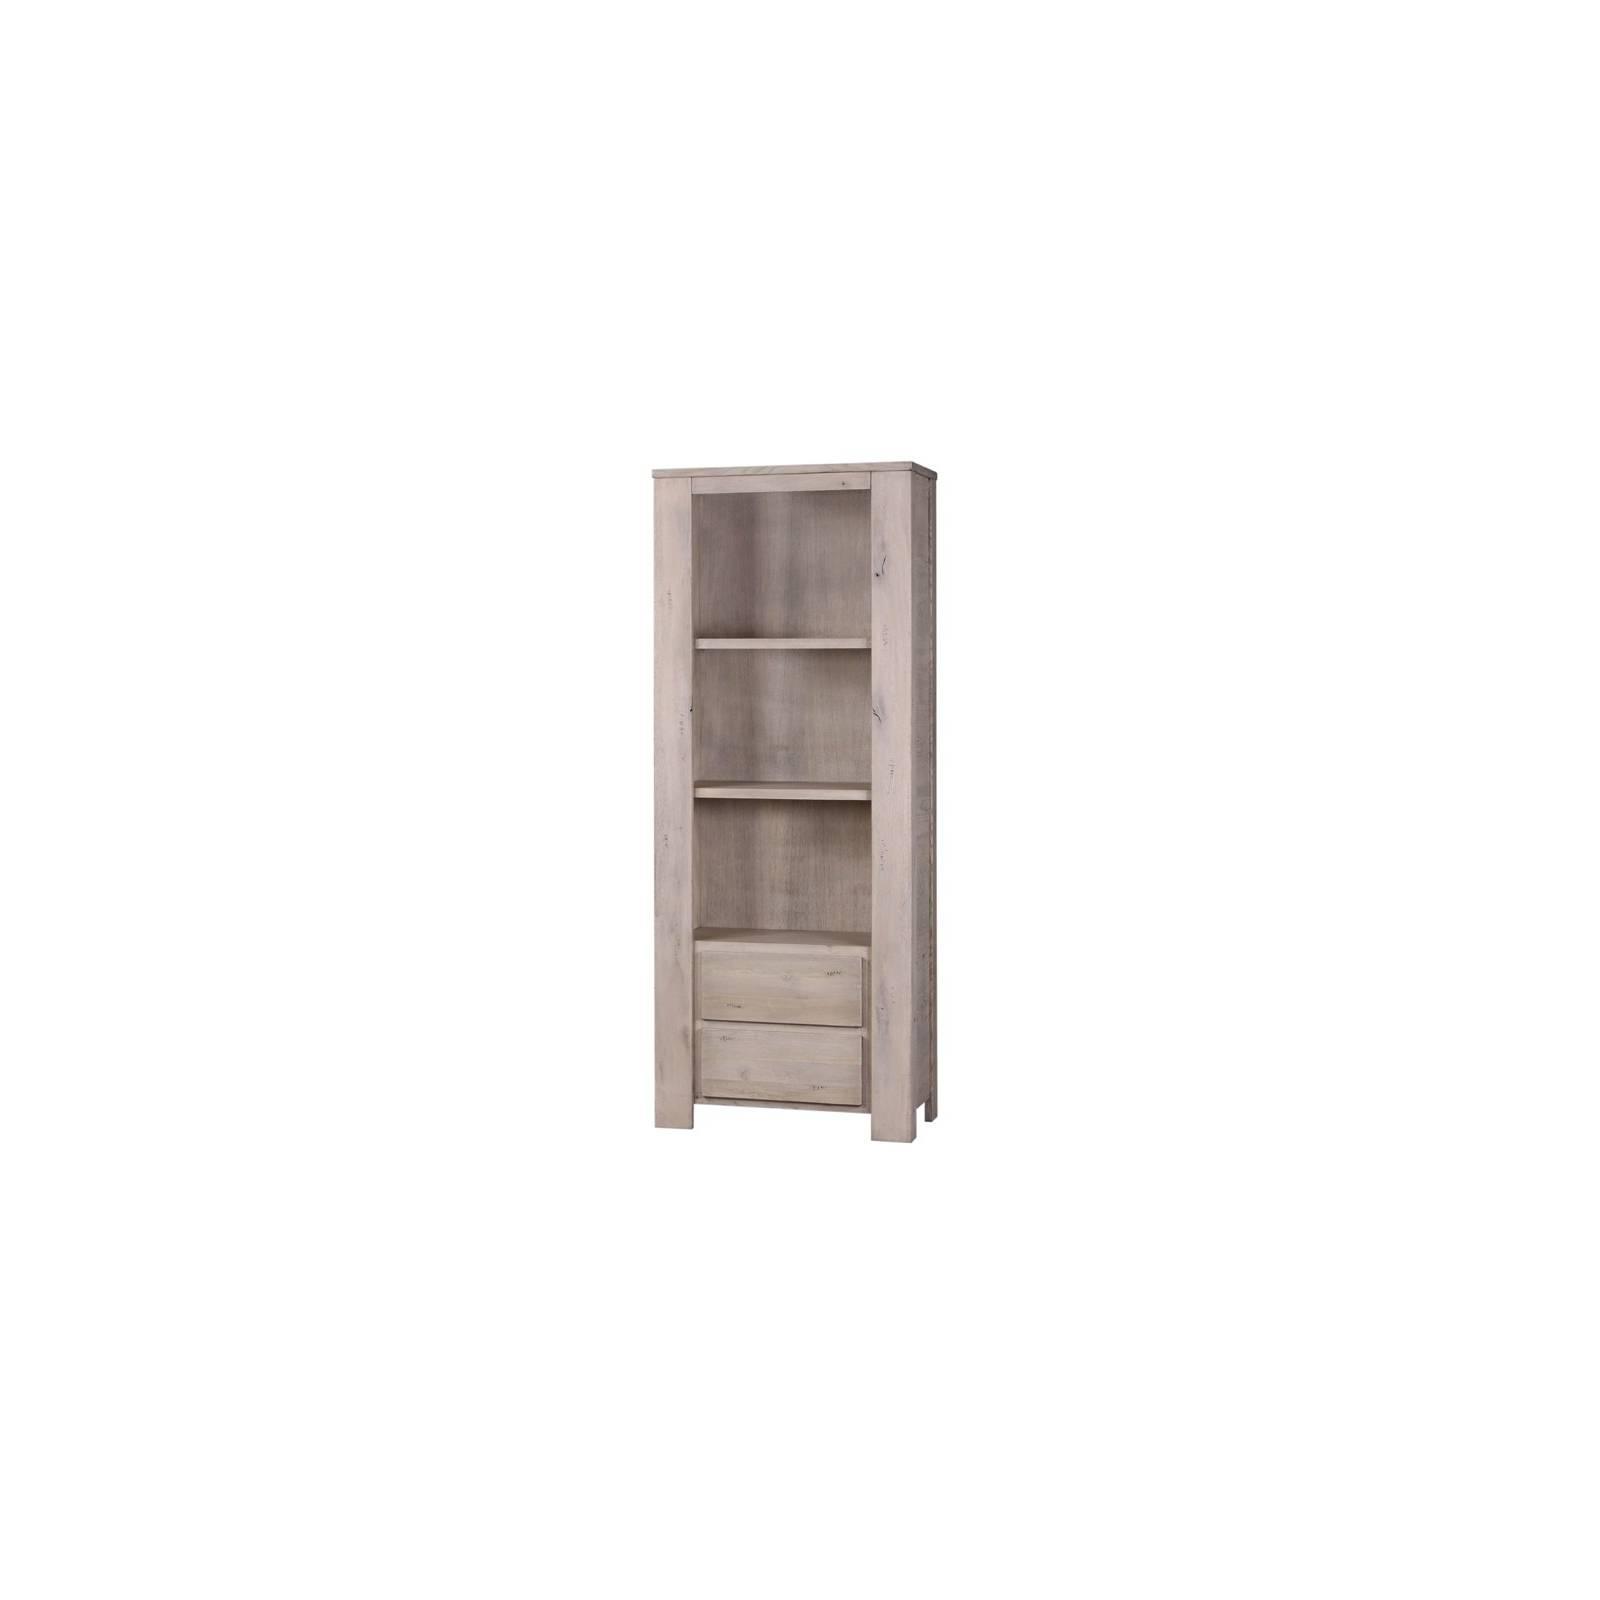 Bibliothèque Milena Grigia Chêne - meuble style design